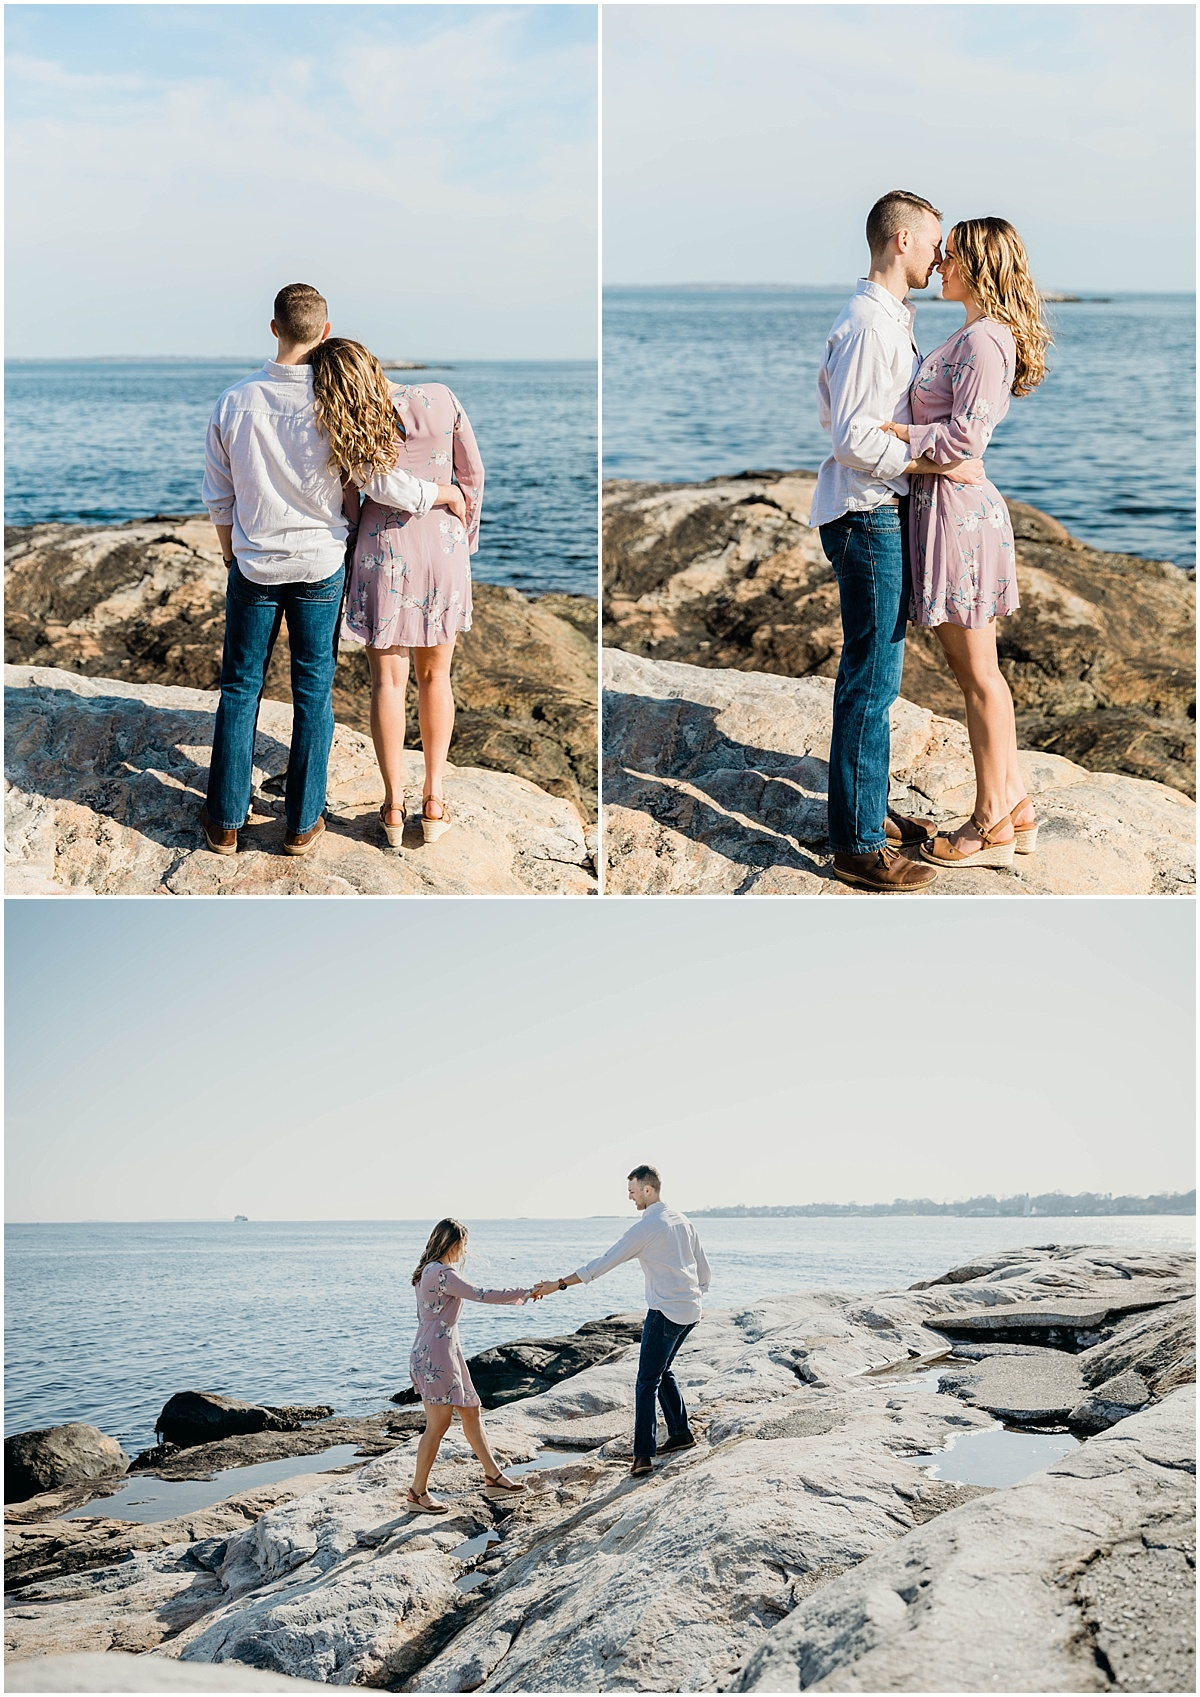 Cora Jane Photo Company - wedding photographer - new england wedding - mystic connecticut_0139.jpg